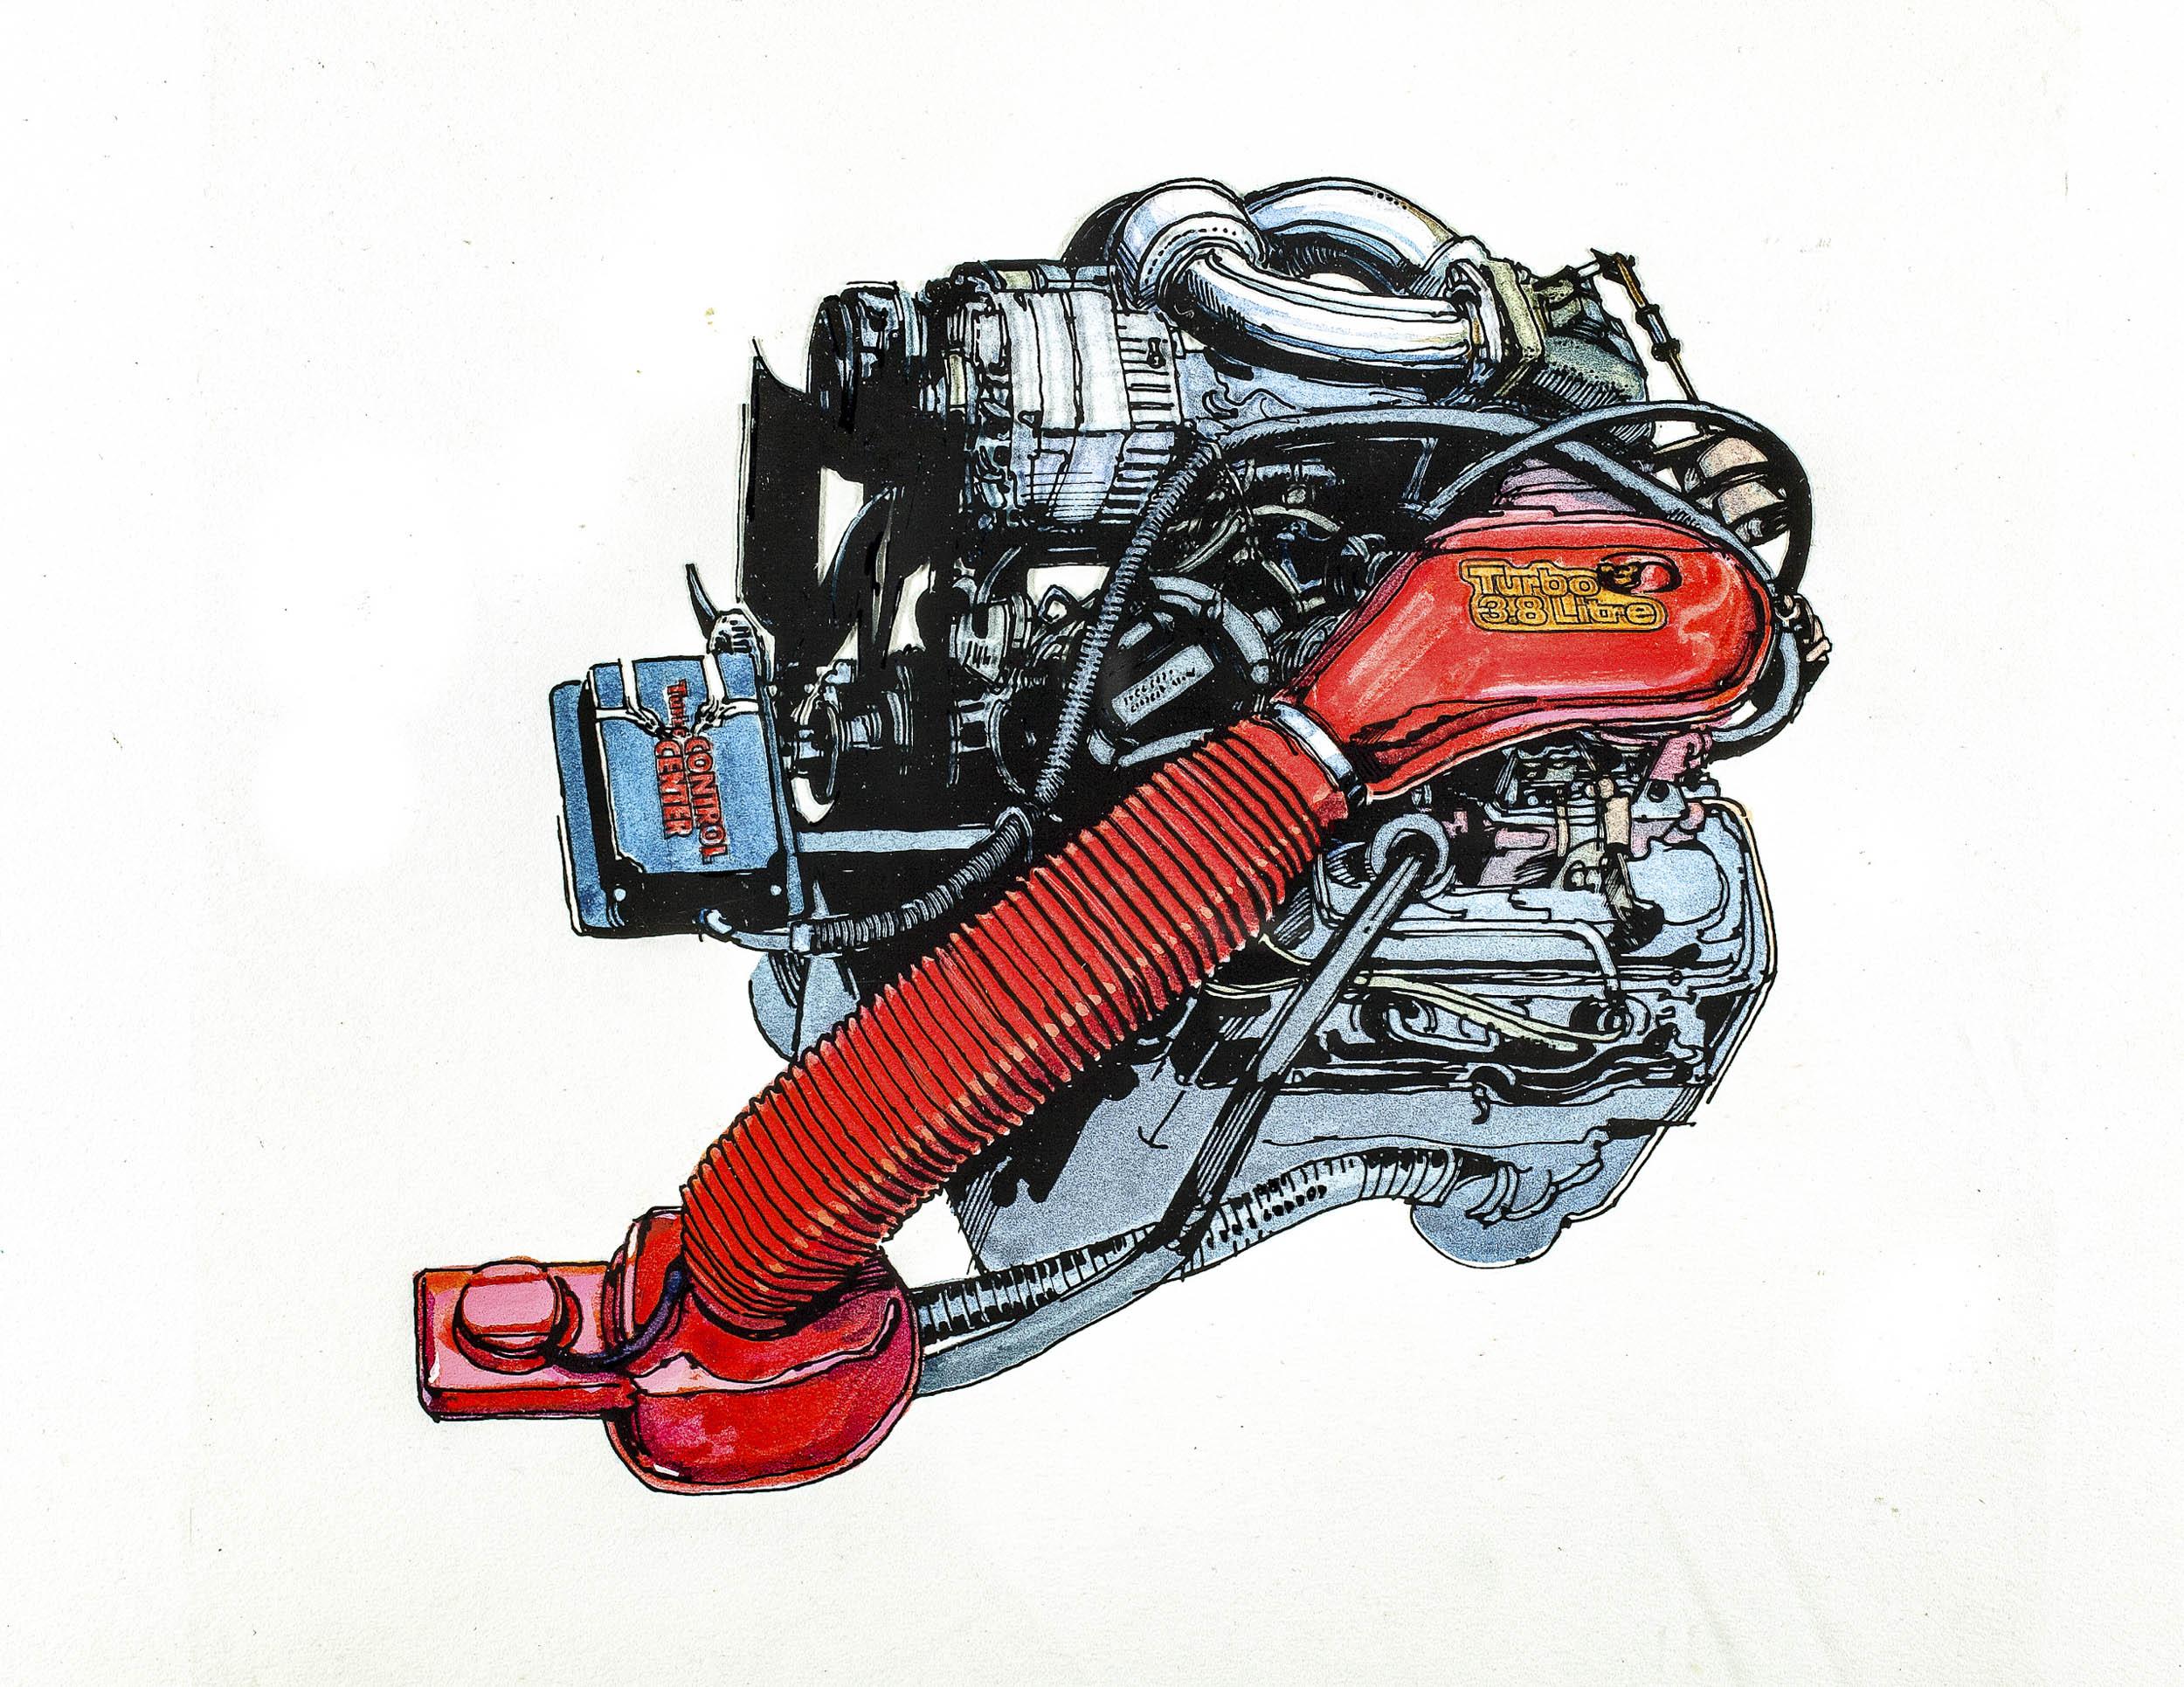 The 1978 Buick 3.8-liter turbocharged V-6